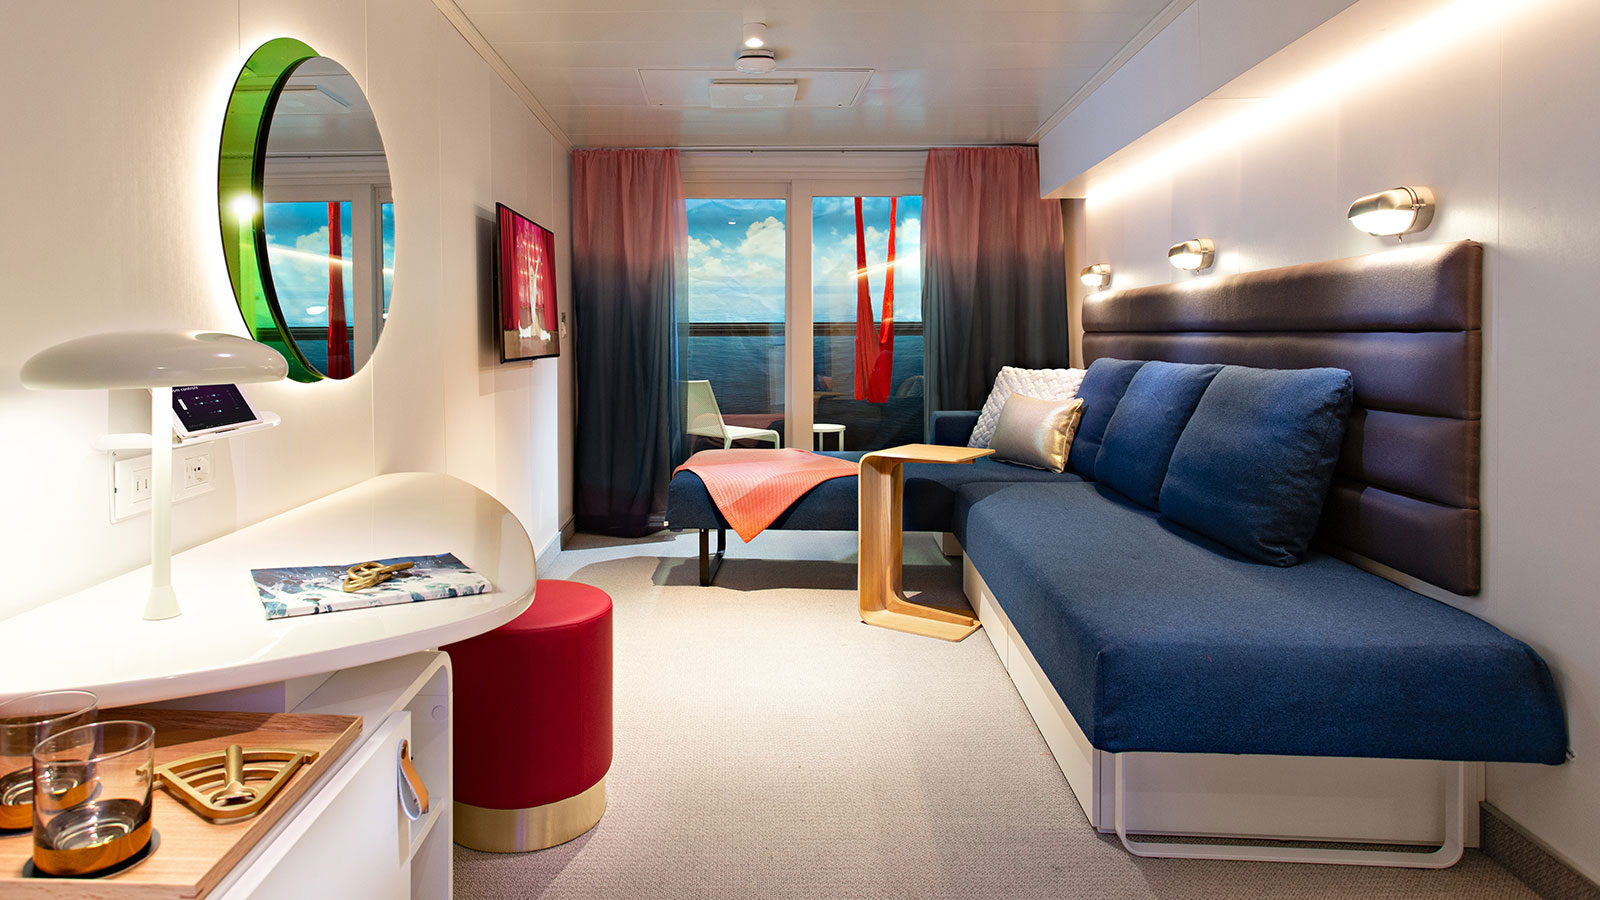 Sea Terrace Cabin - Scarlet Lady - Virgin Voyages 1